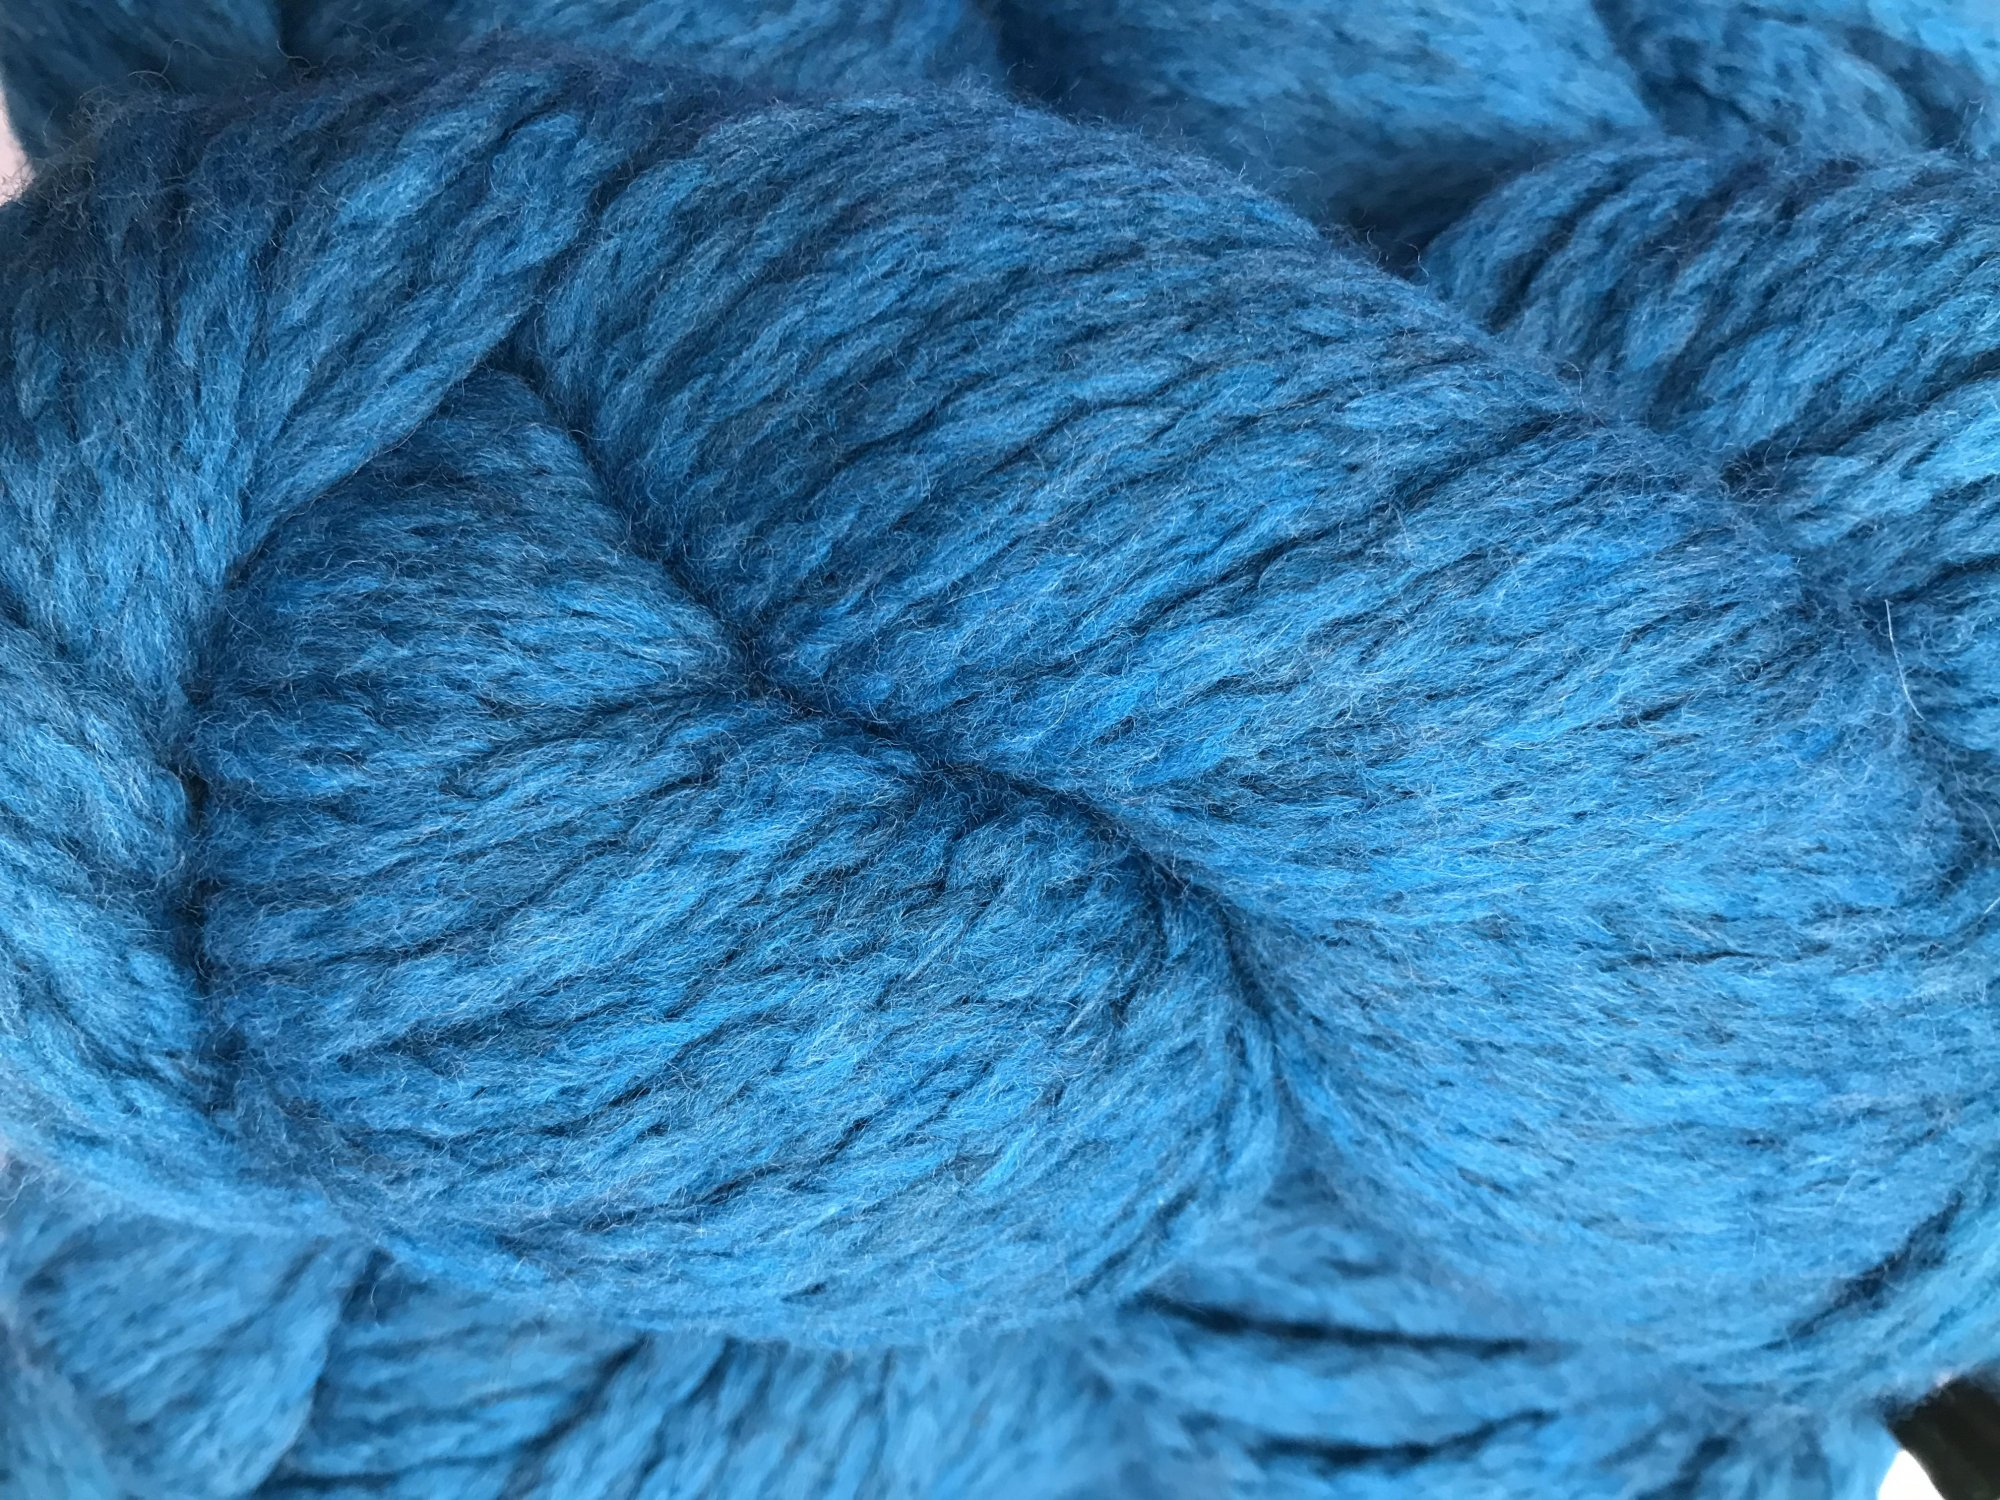 Teal 1727 Mirasol Ushya 98/2 wool/poly 114y, 2.25sts=1on #15US